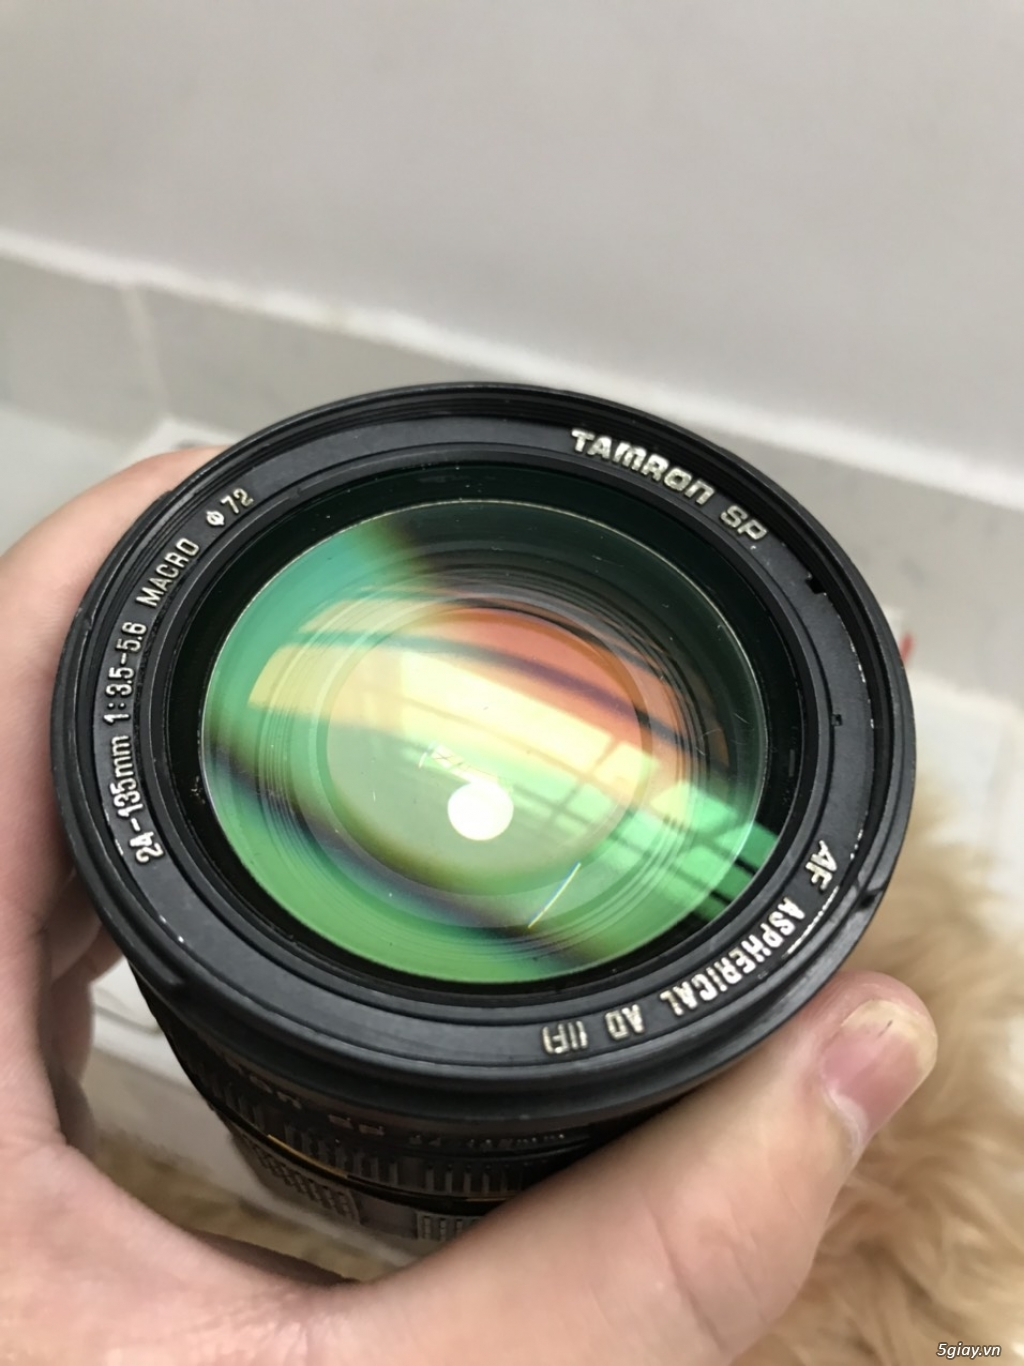 Cần bán Canon 700D + Lens kit 18-55 STM + Lens Tamron 24-135, full box - 1